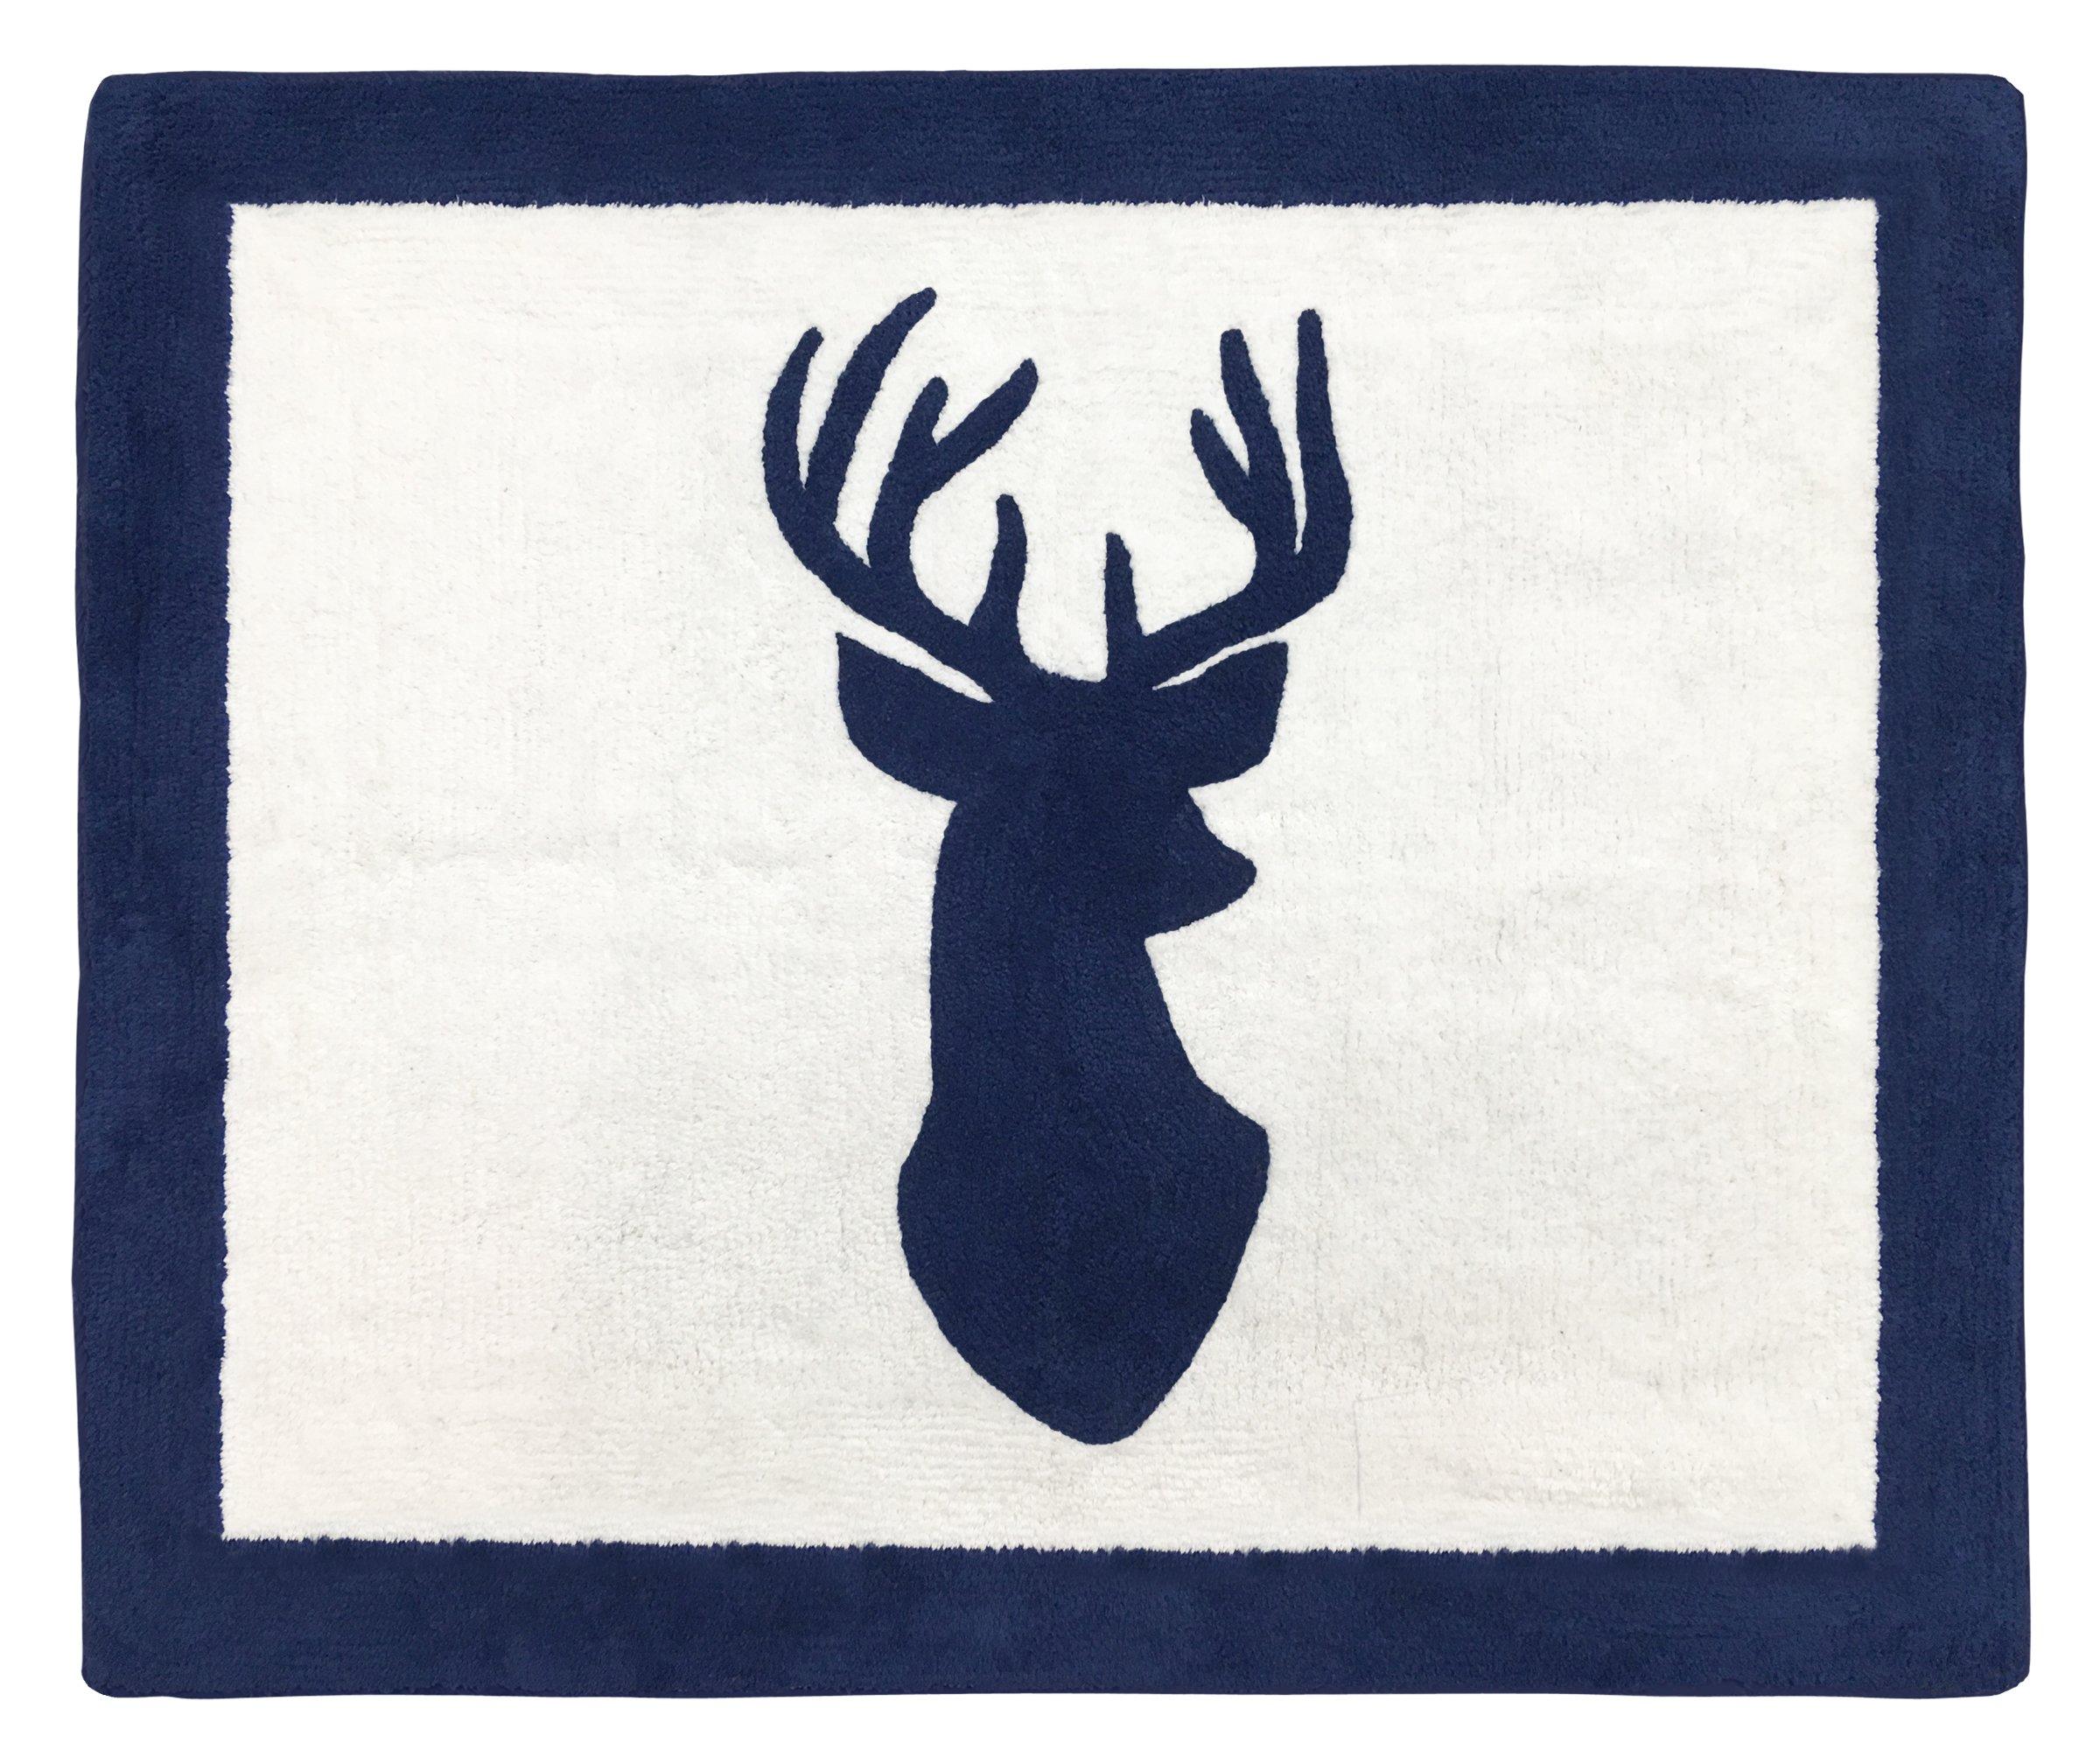 Sweet Jojo Designs Boys Accent Floor Rug Bedroom Decor for Navy and White Woodland Deer Kids Bedding Collection